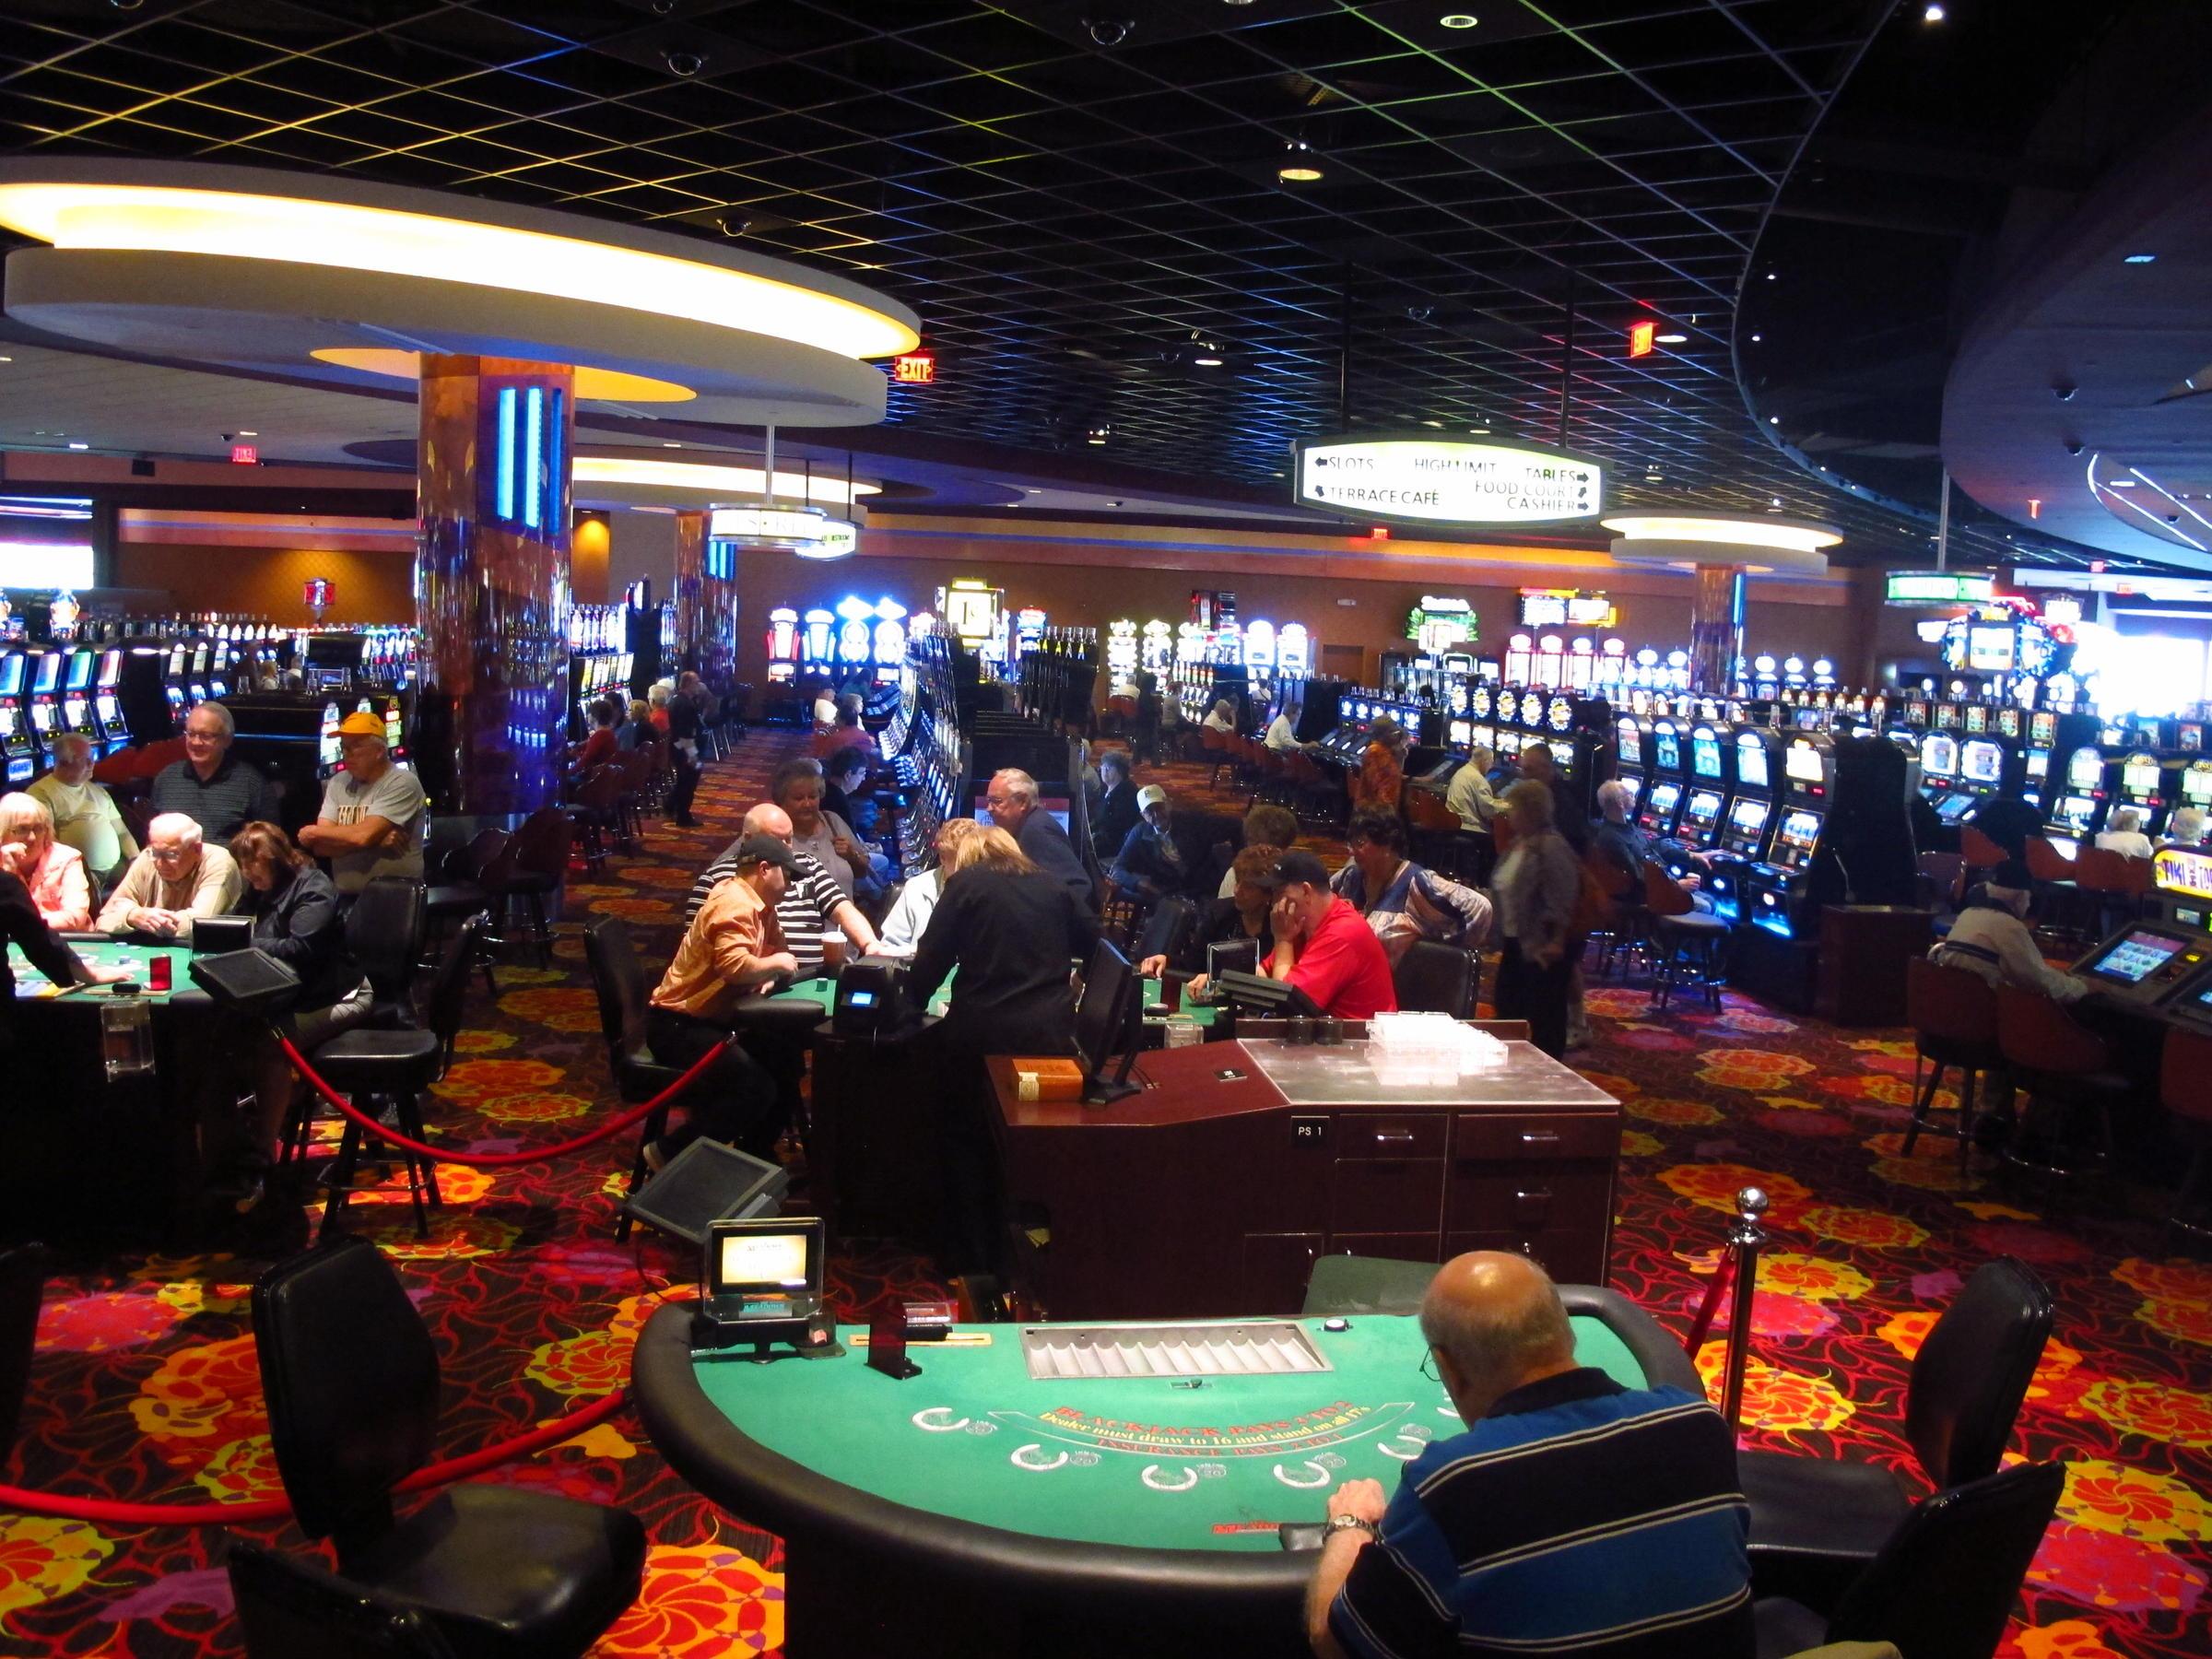 Nh casino gambling east bay hotel and casino